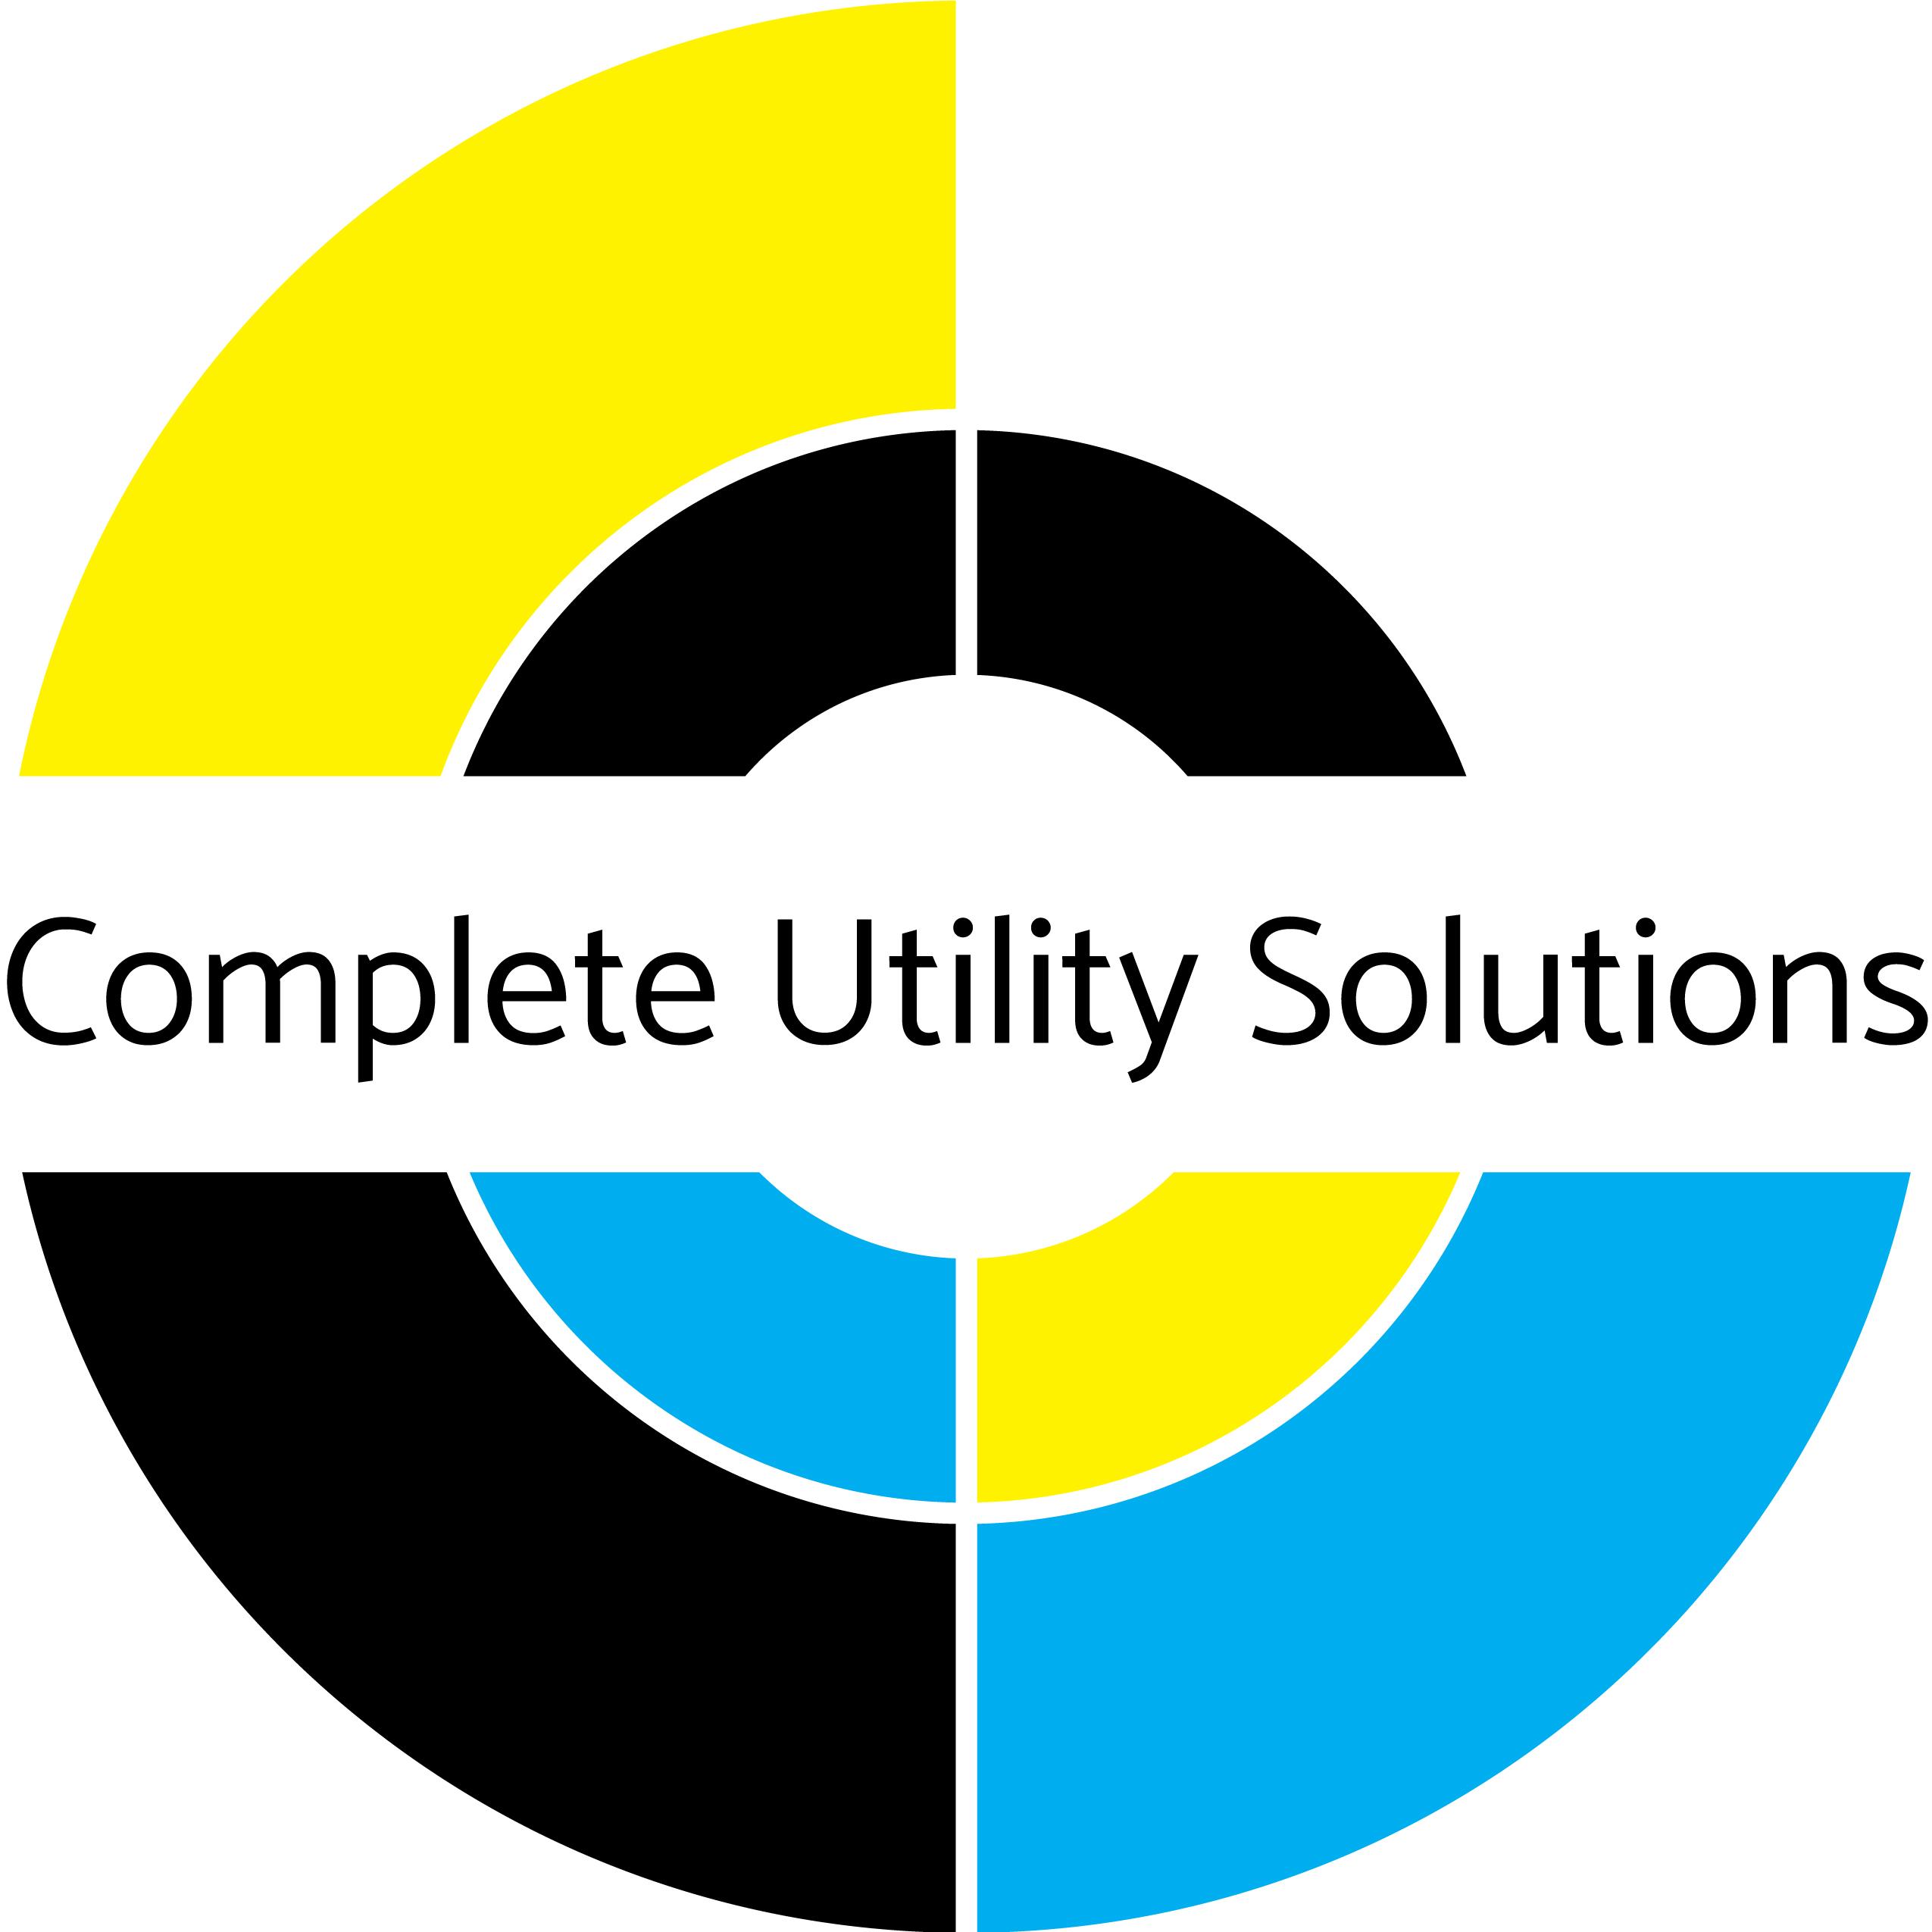 Complete Utility Solutions_colour